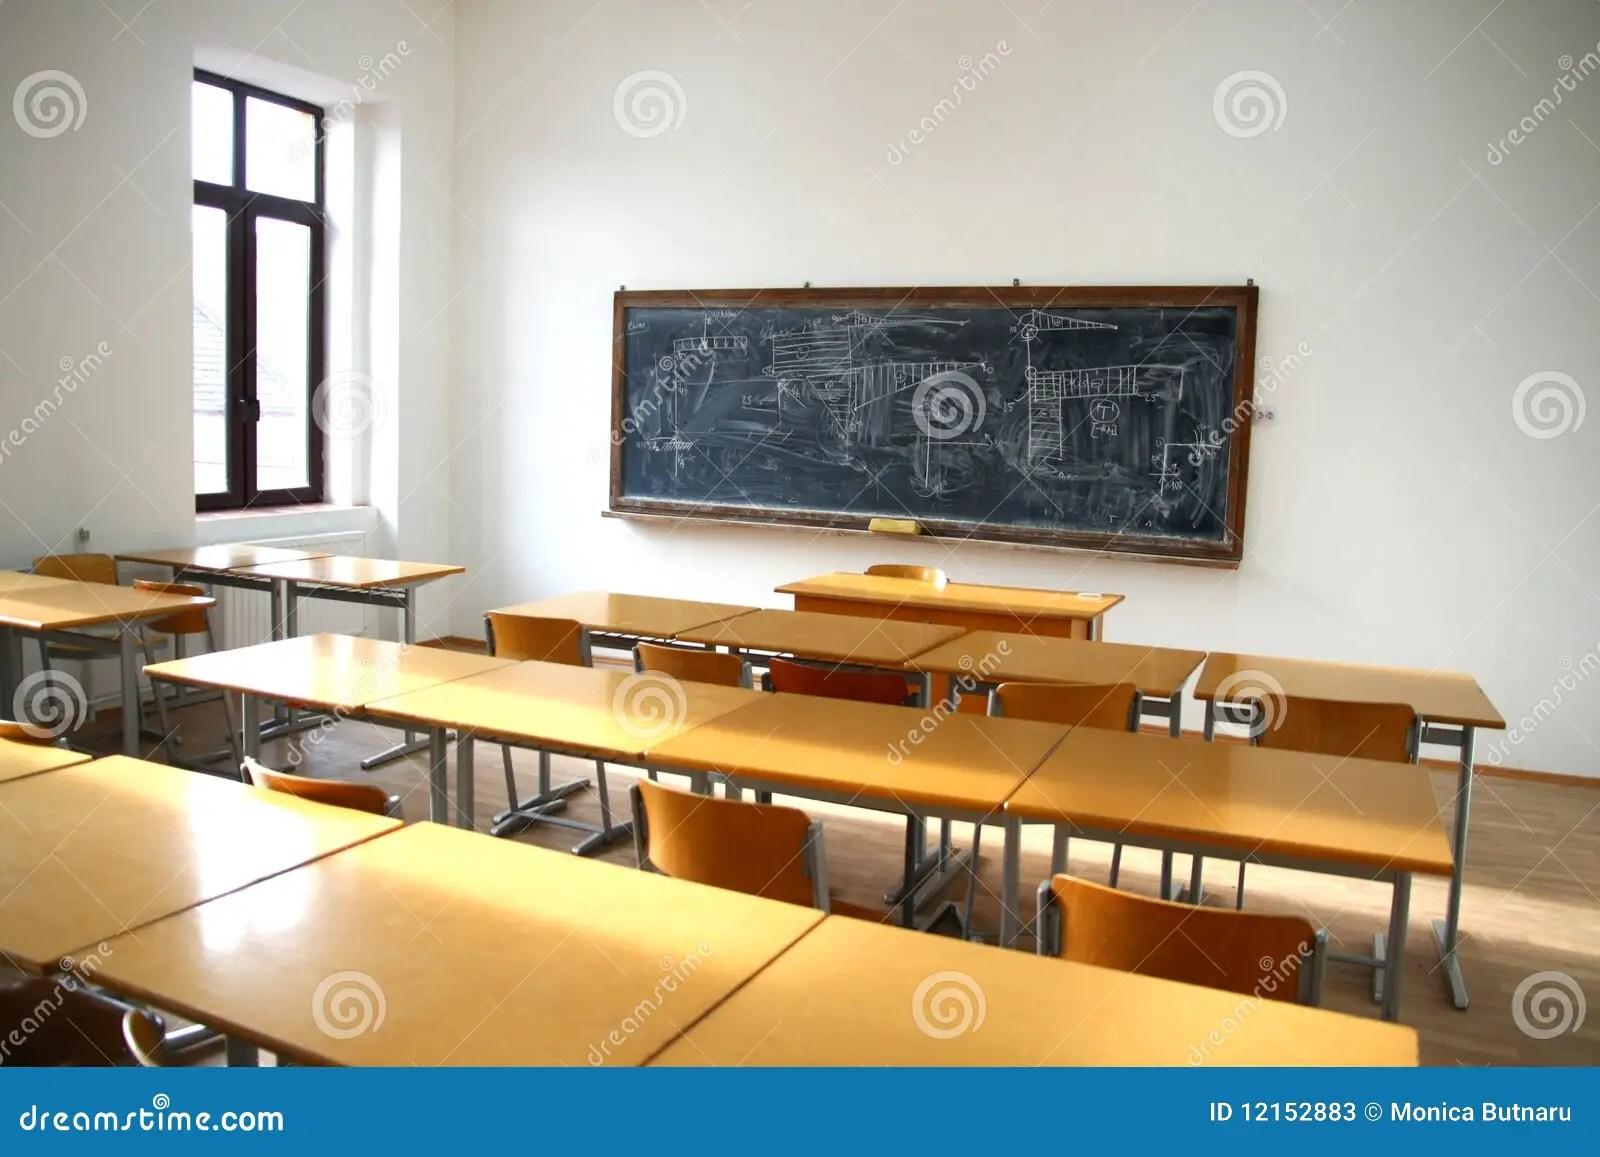 Traditional Classroom Interior Stock Image  Image 12152883